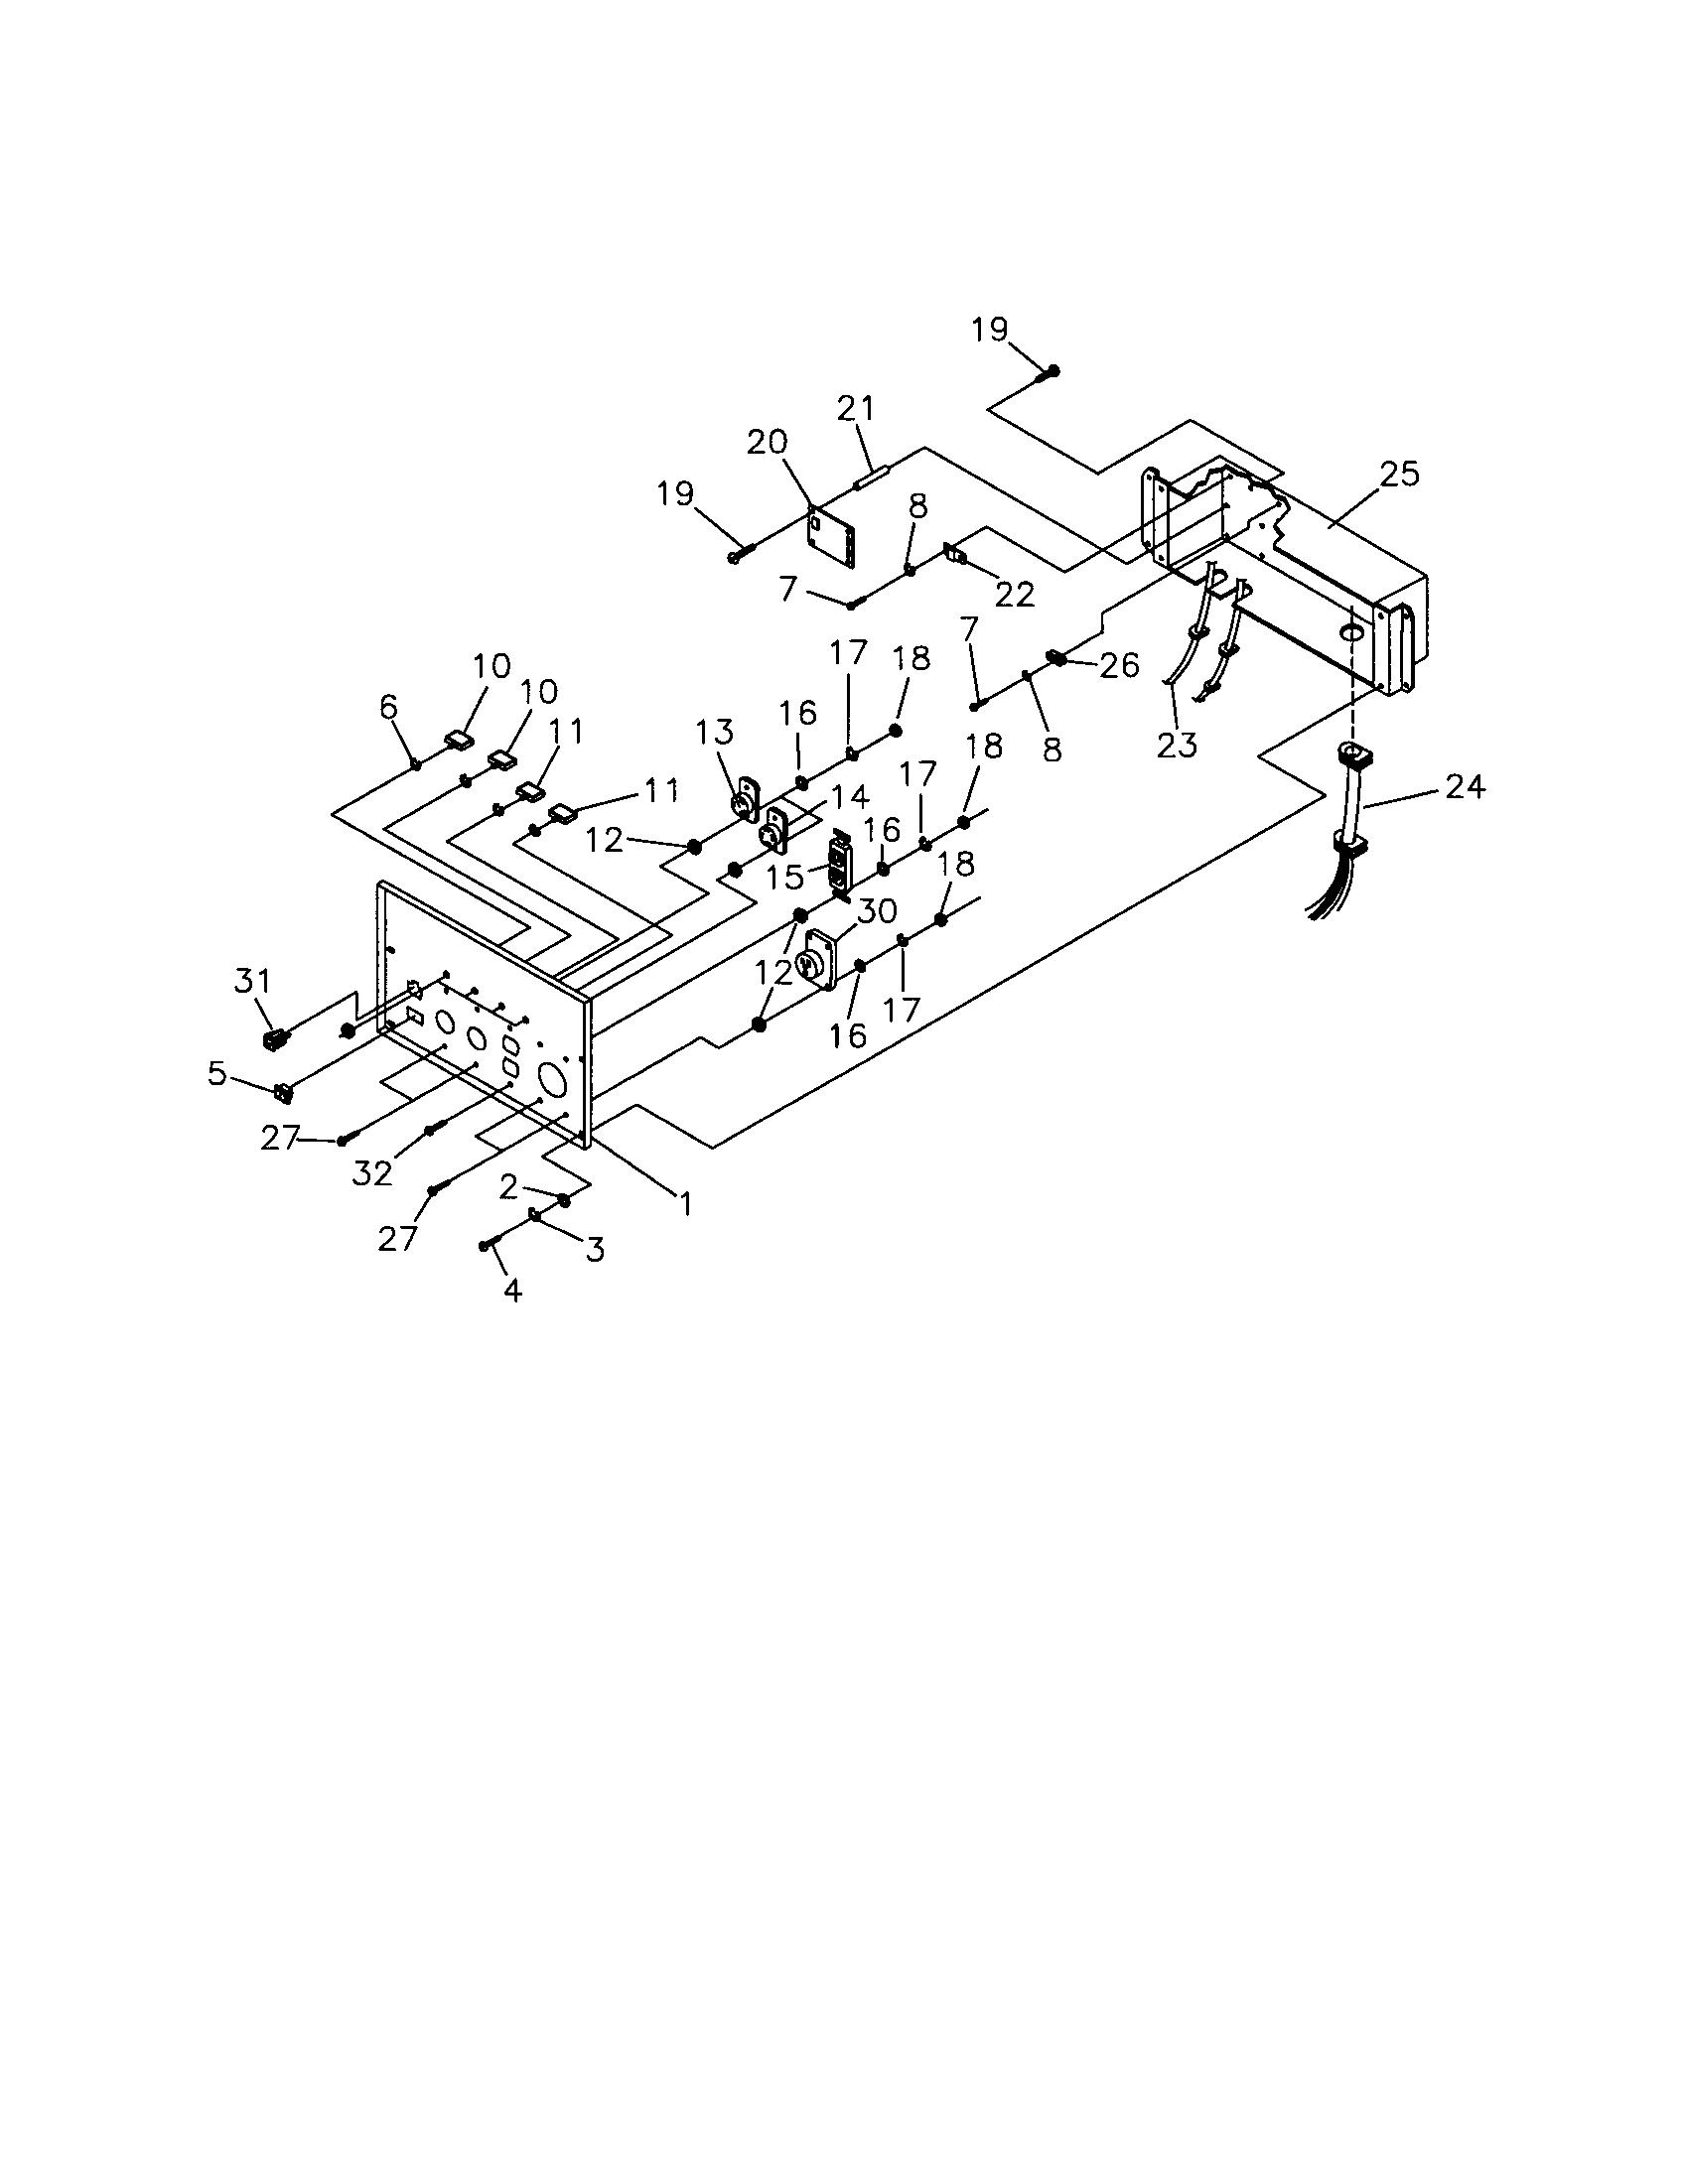 Craftsman model 580327181 generator genuine parts